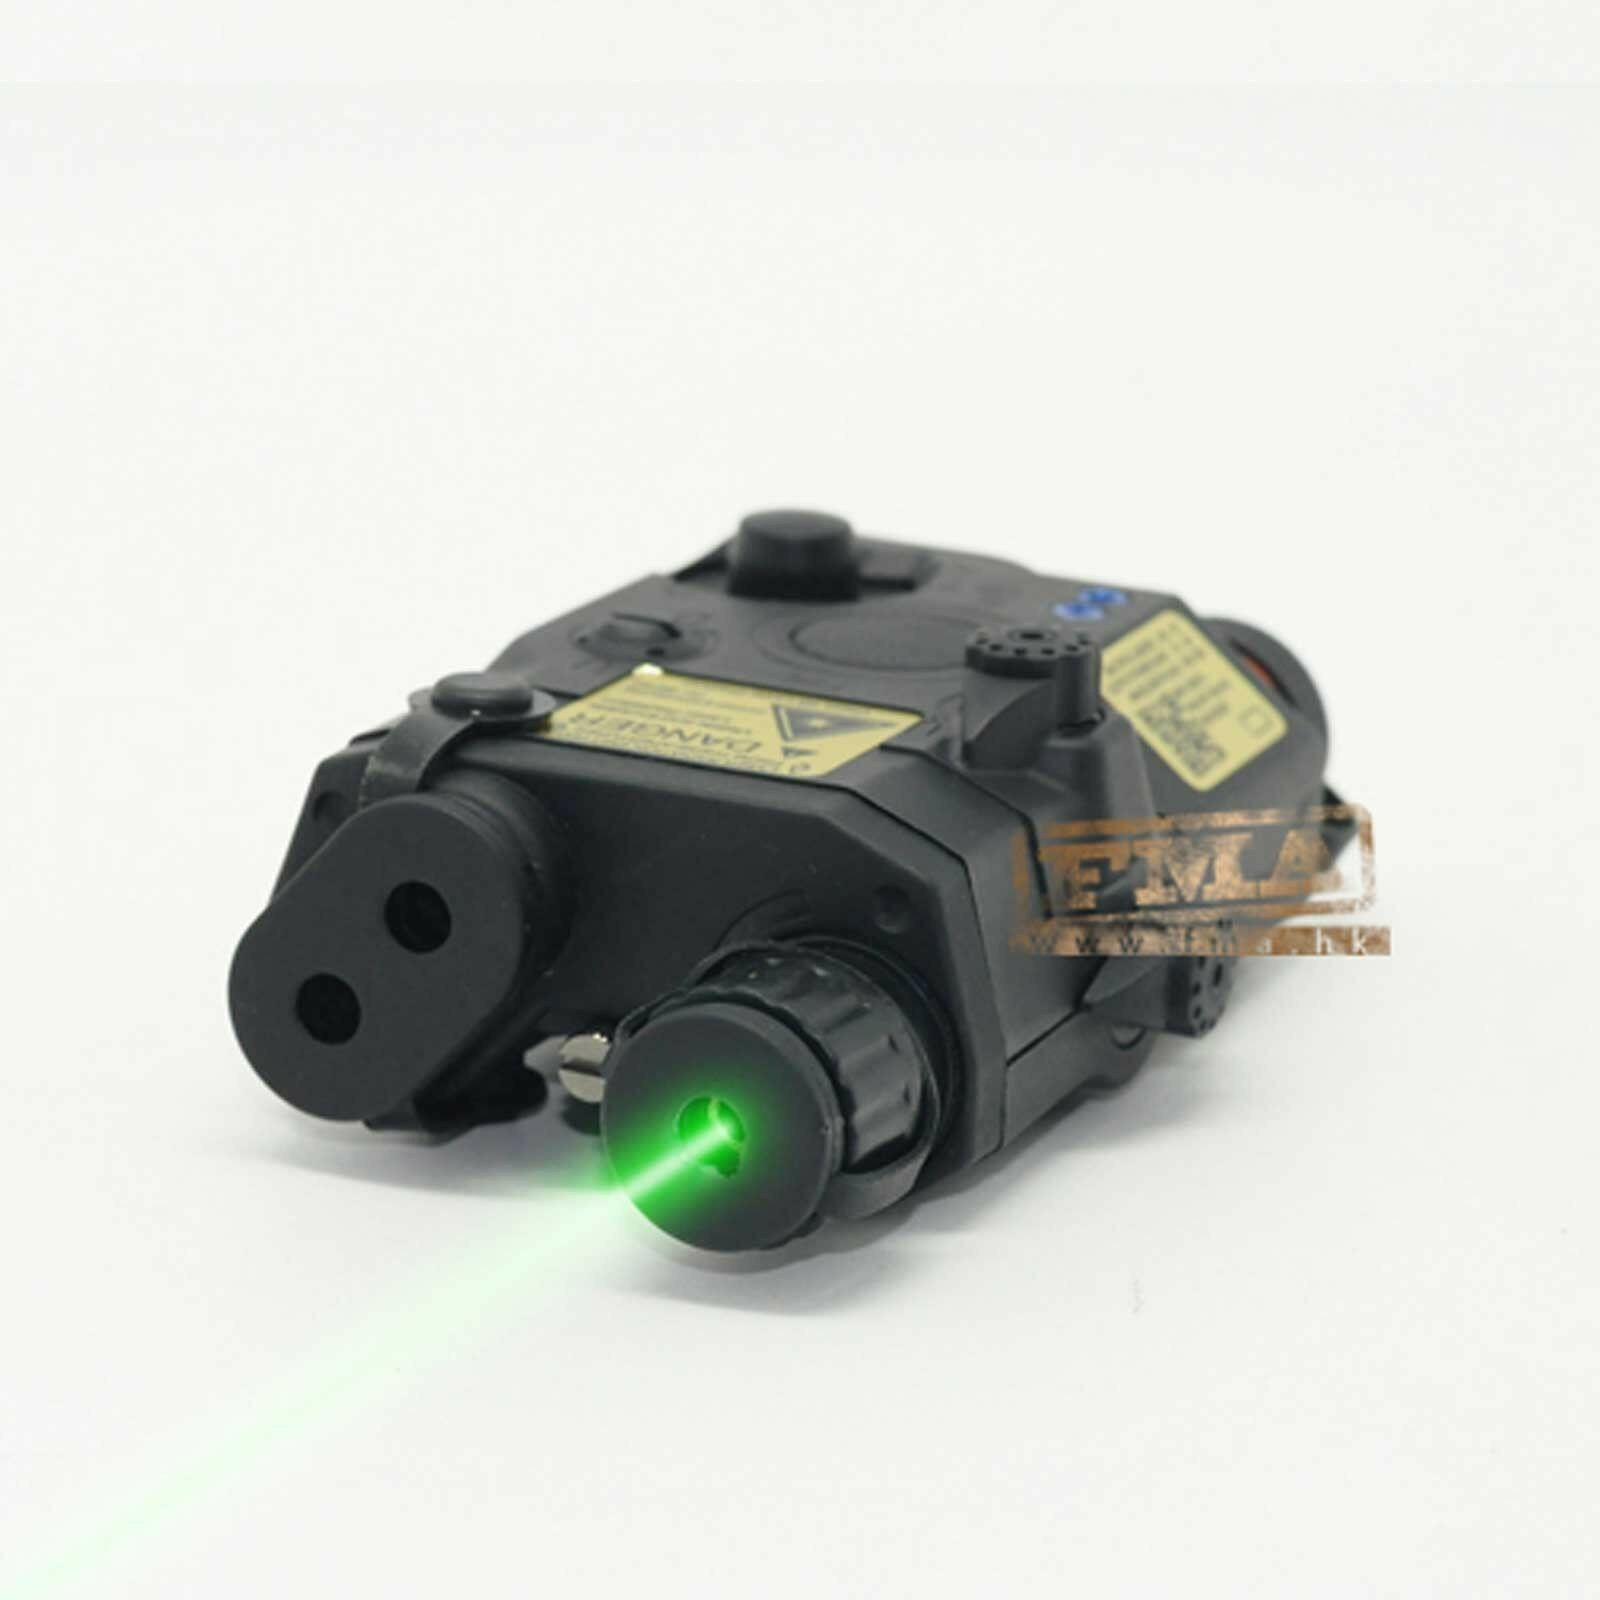 NEU LA-5 PEQ-15 Akku Gehäuse & Größer Laser (BK) TA547